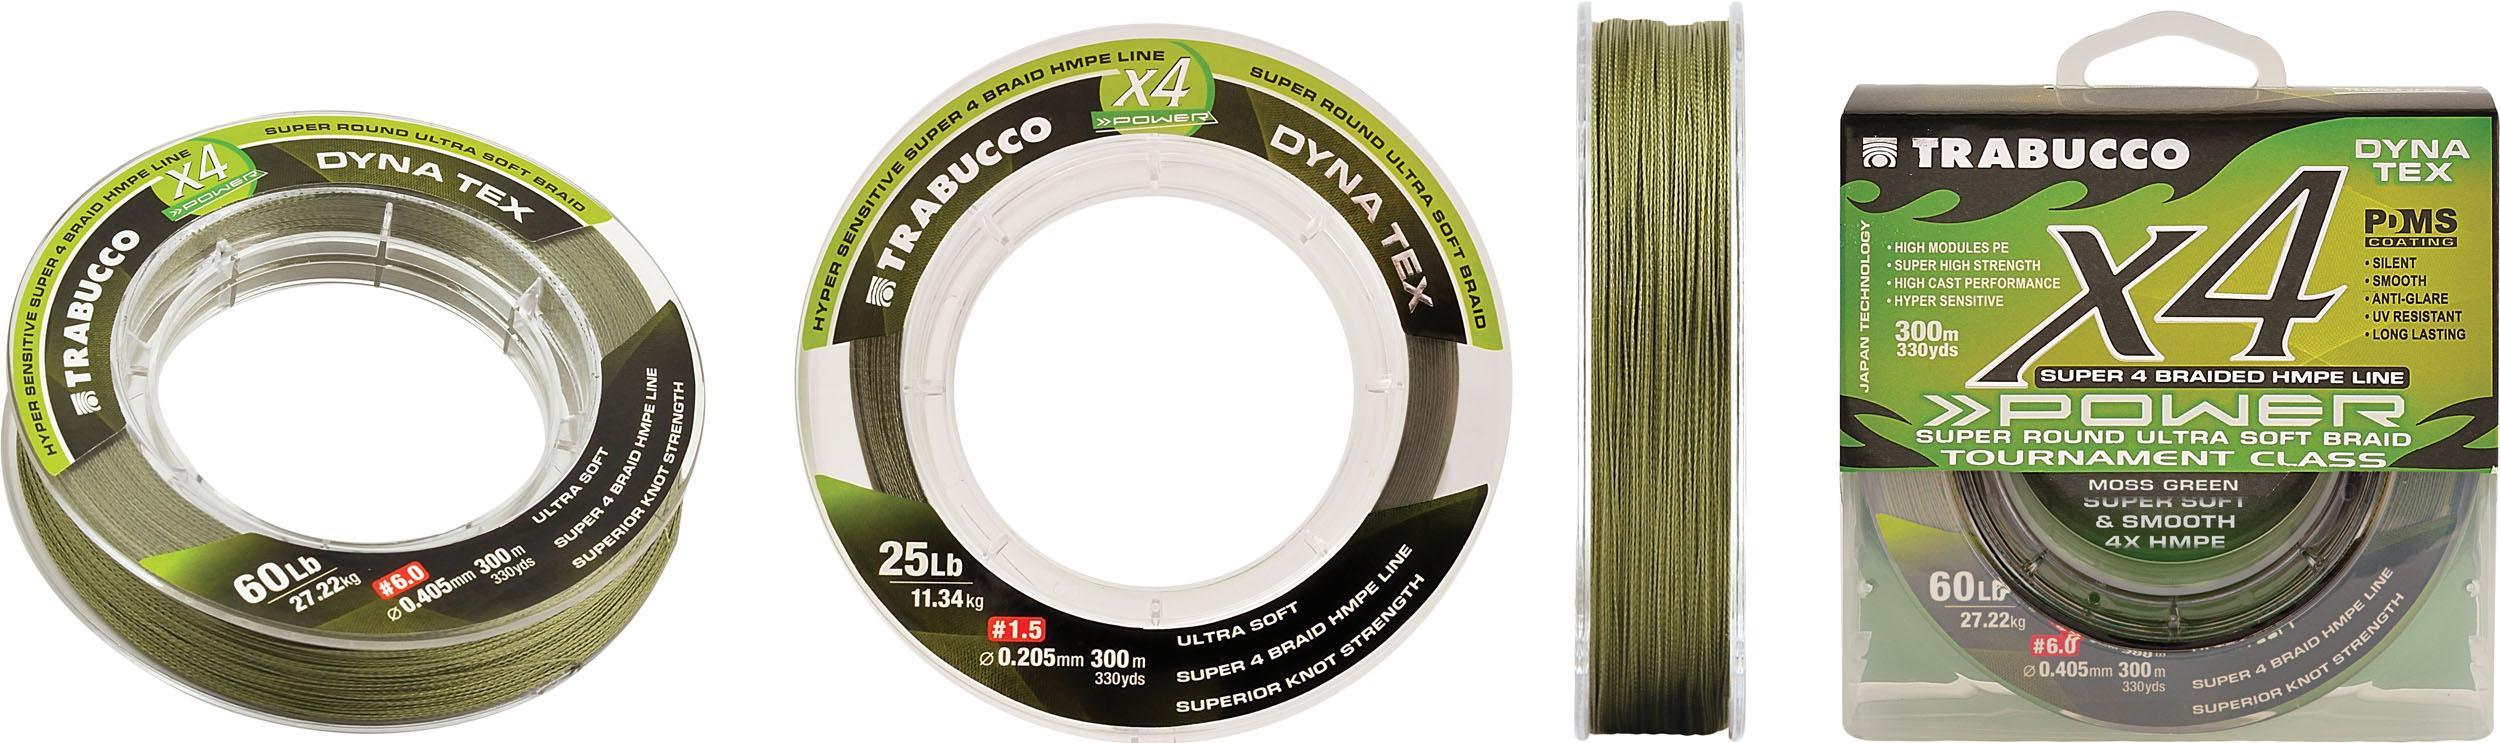 Trabucco Dyna Tex X4 Power 300m 0.235mm MOSS GREEN